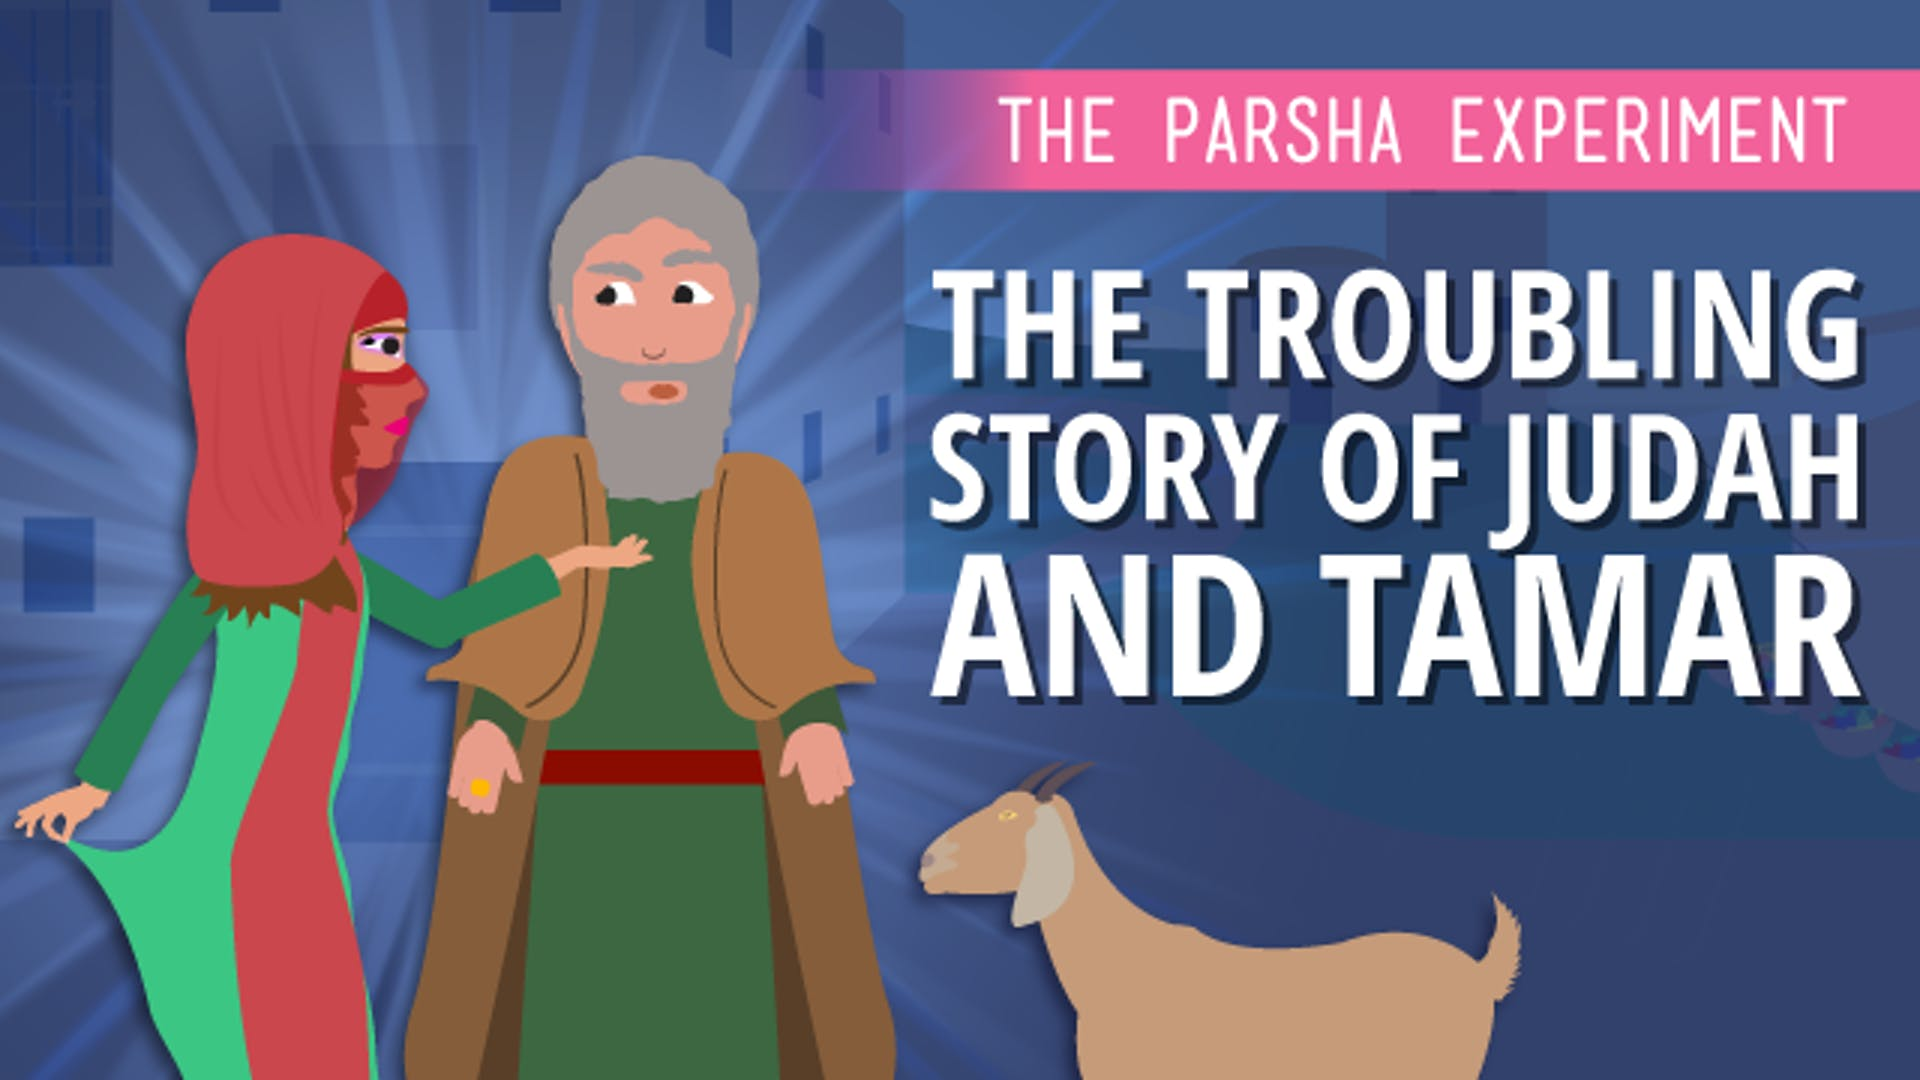 Judah tamar story significance